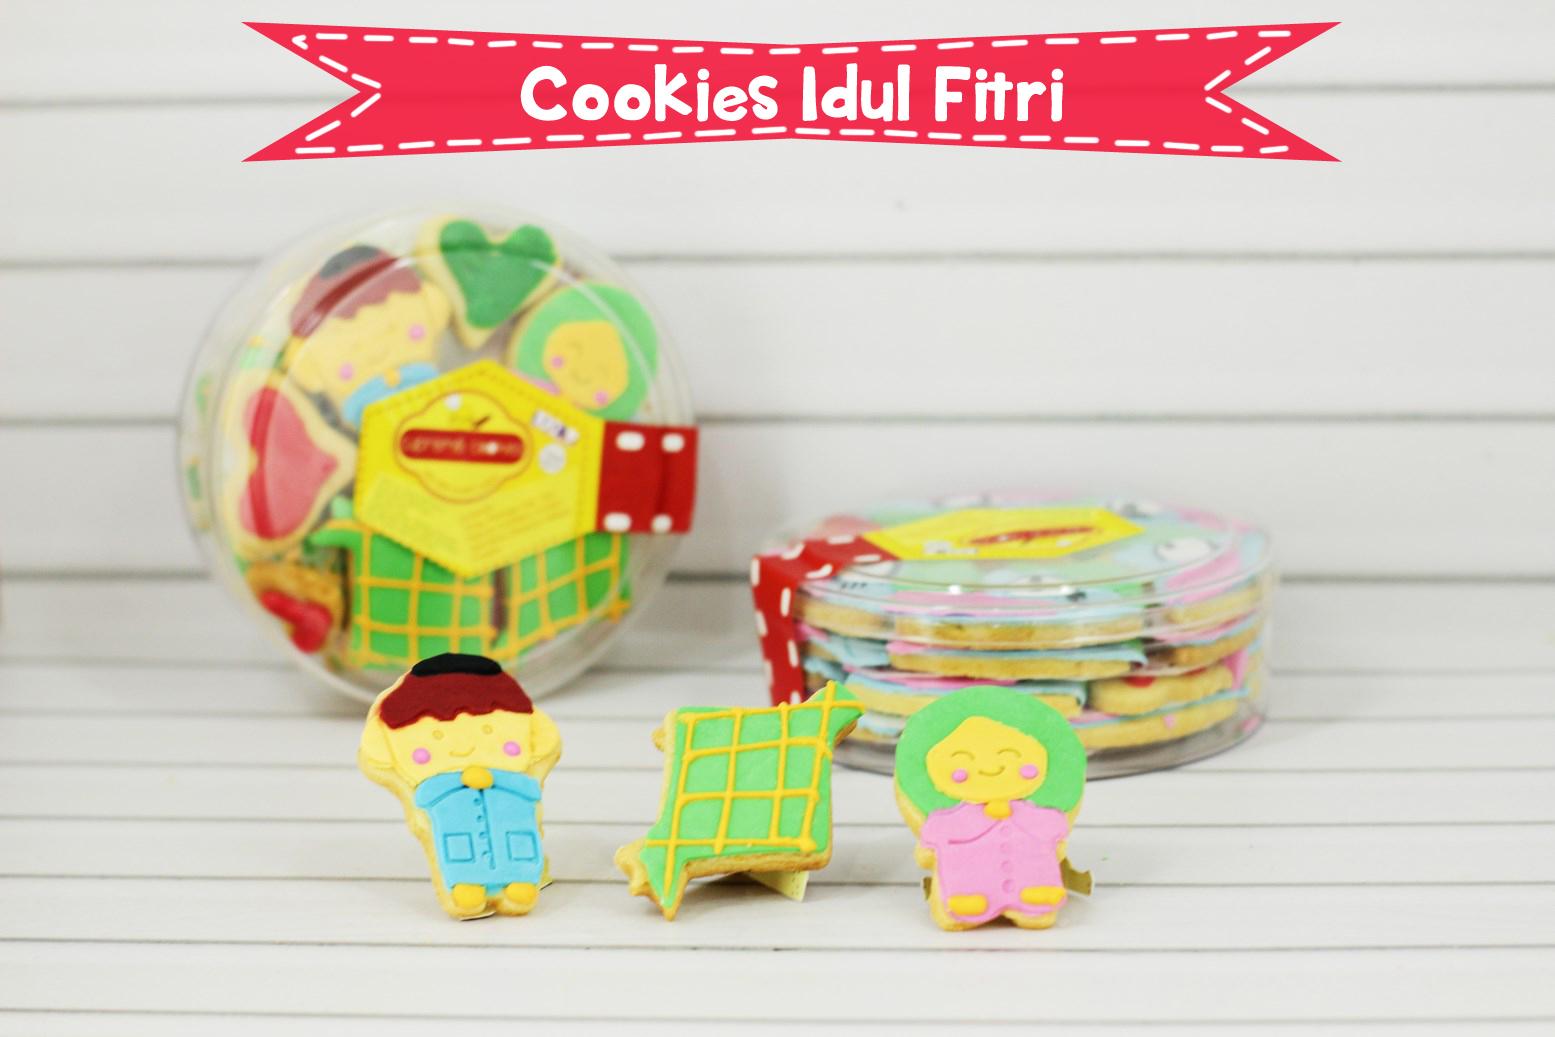 katalog cupreme cookies